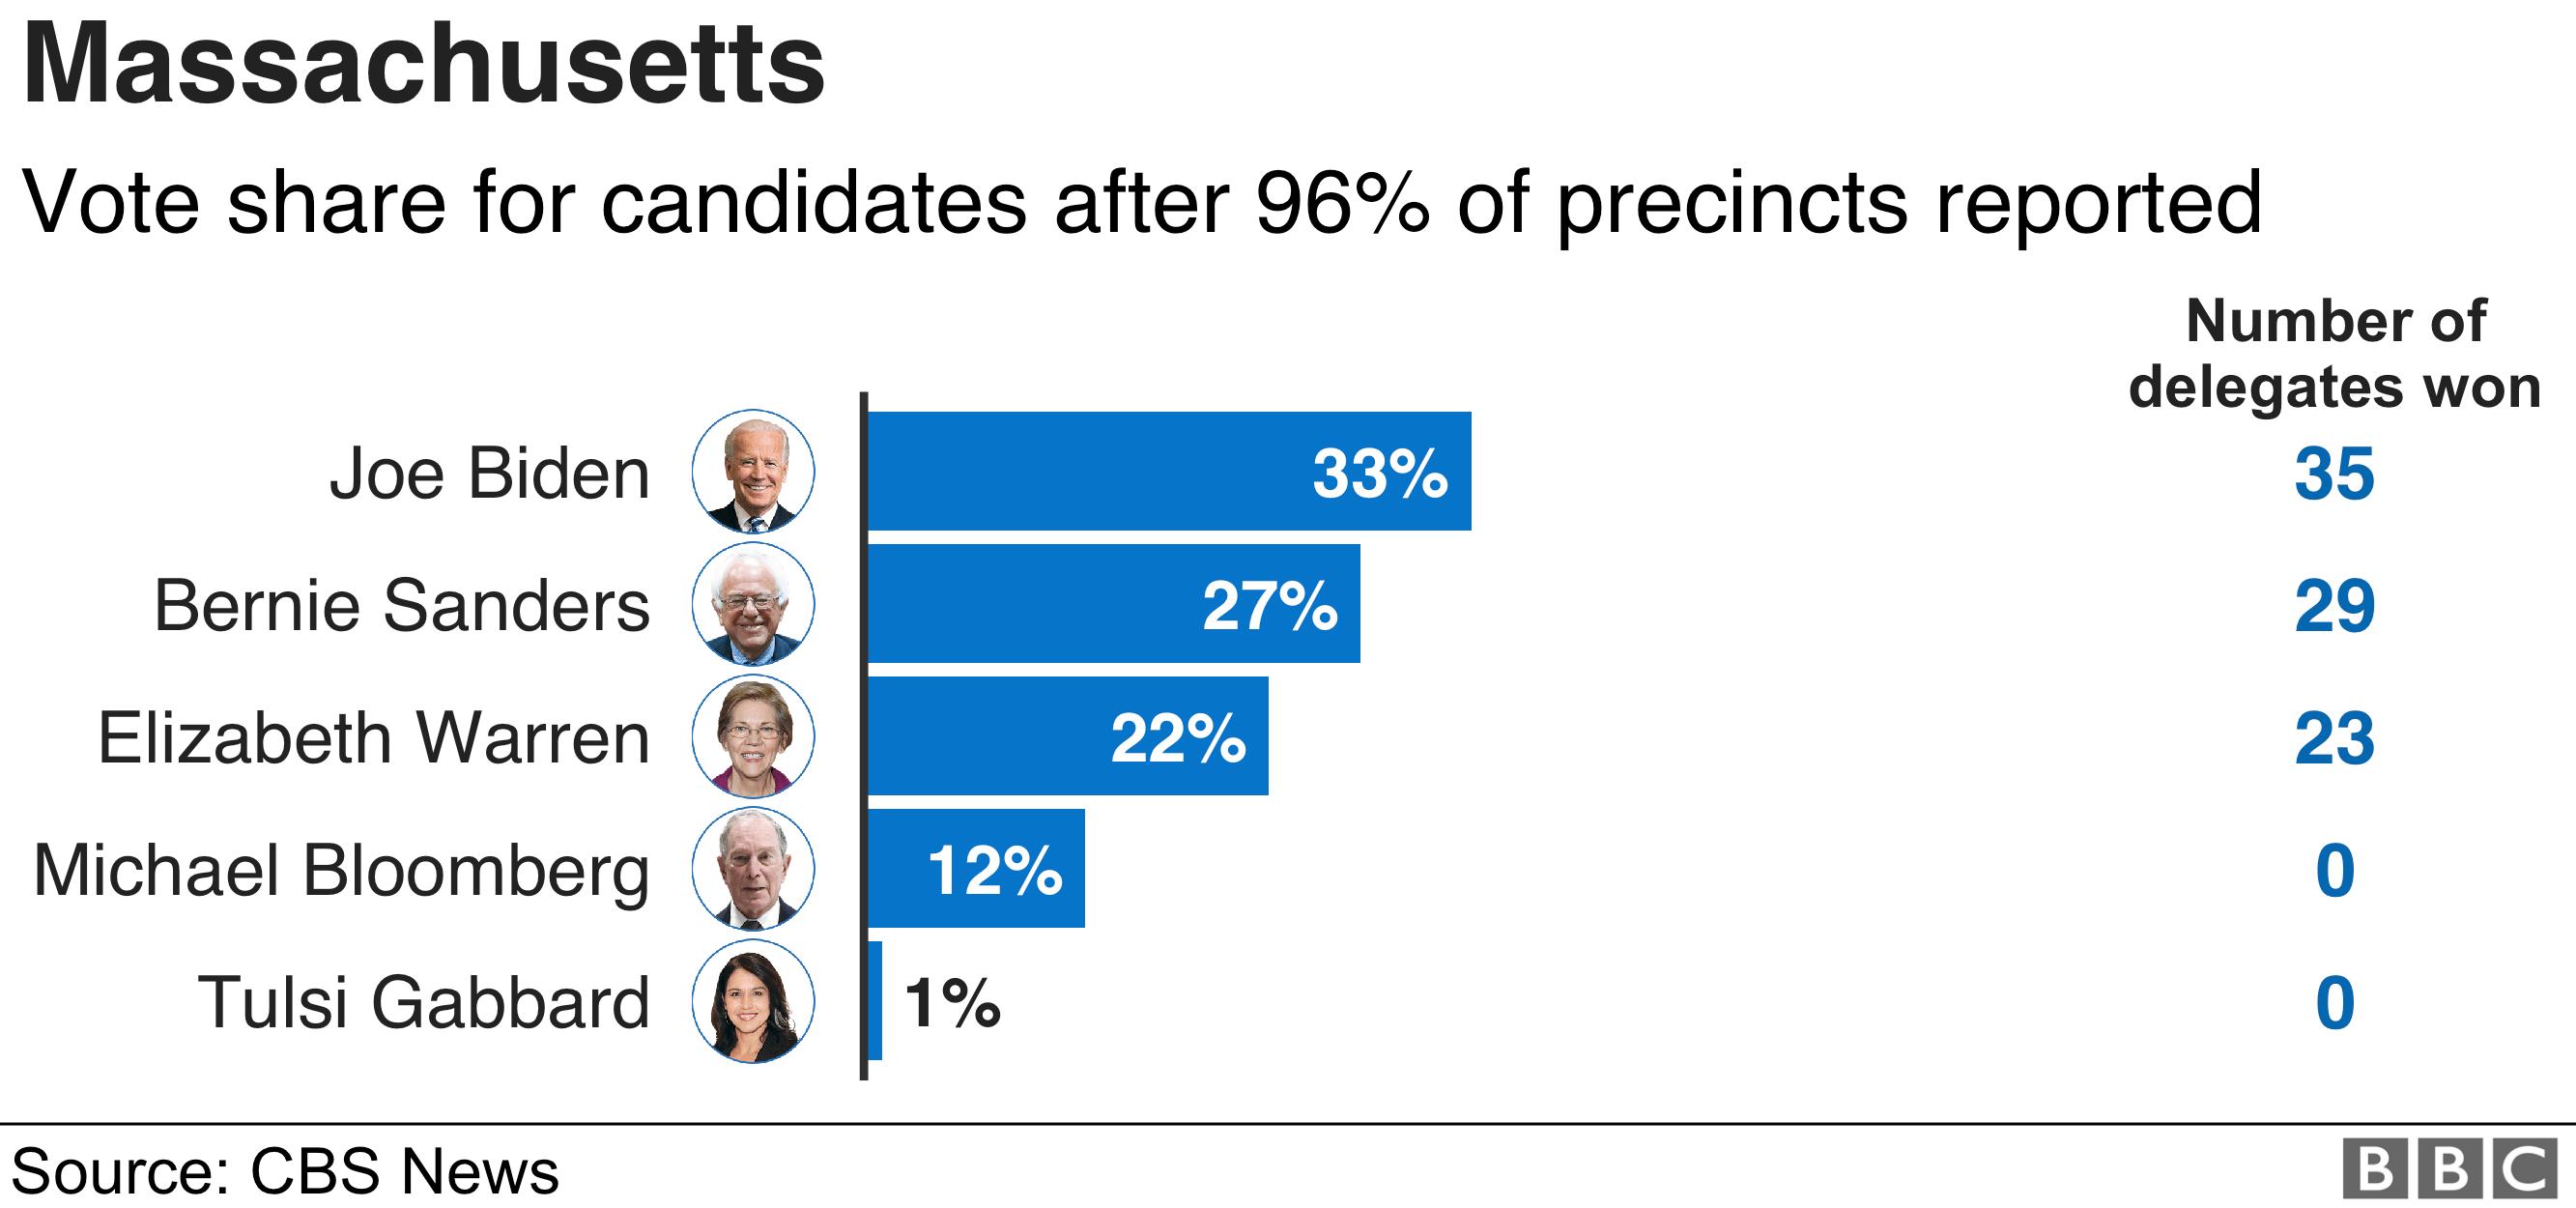 Massachusetts results